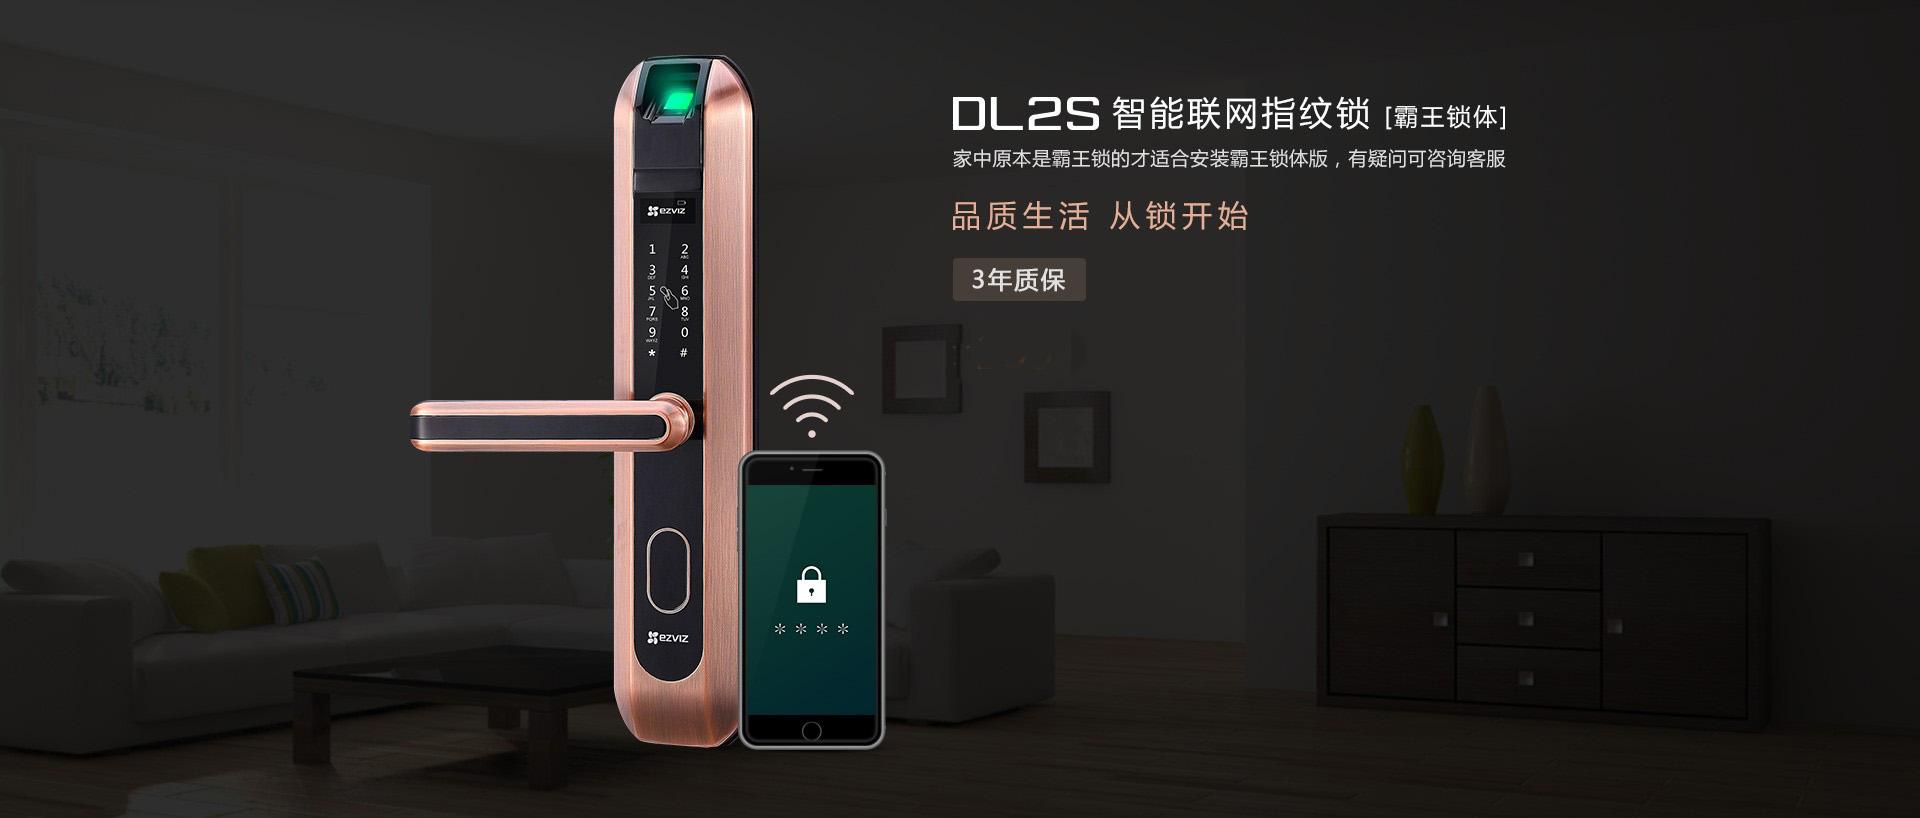 DLSs霸王锁体首屏_更新.jpg